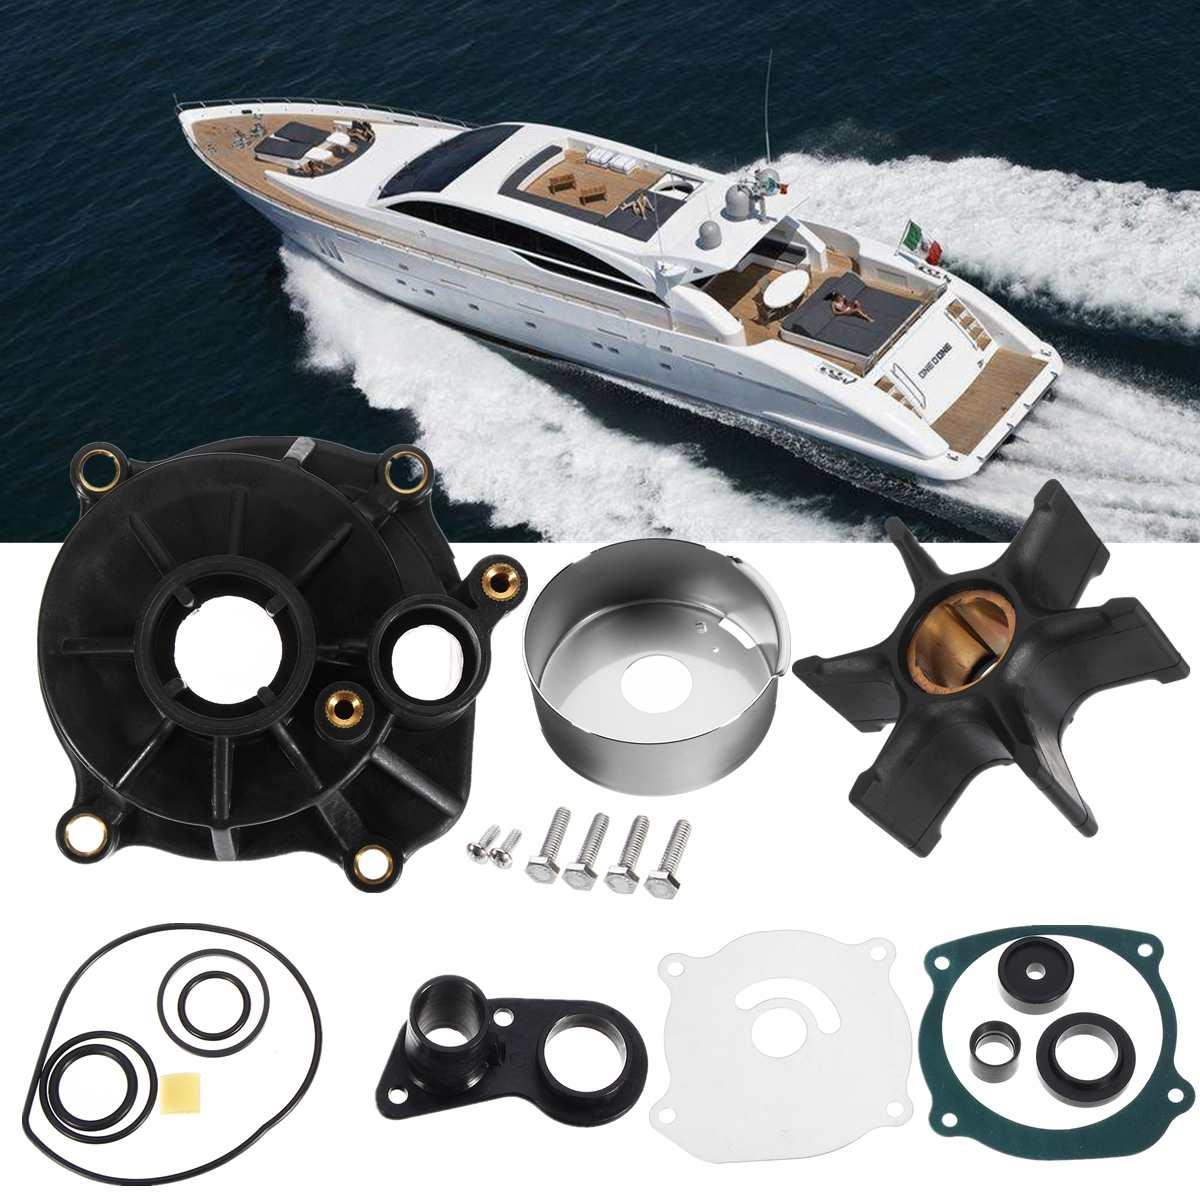 Marine Boat Water Pump Impeller Repair Kit For Johnson Evinrude 85 300HP 5001594 Boat Parts Accessories